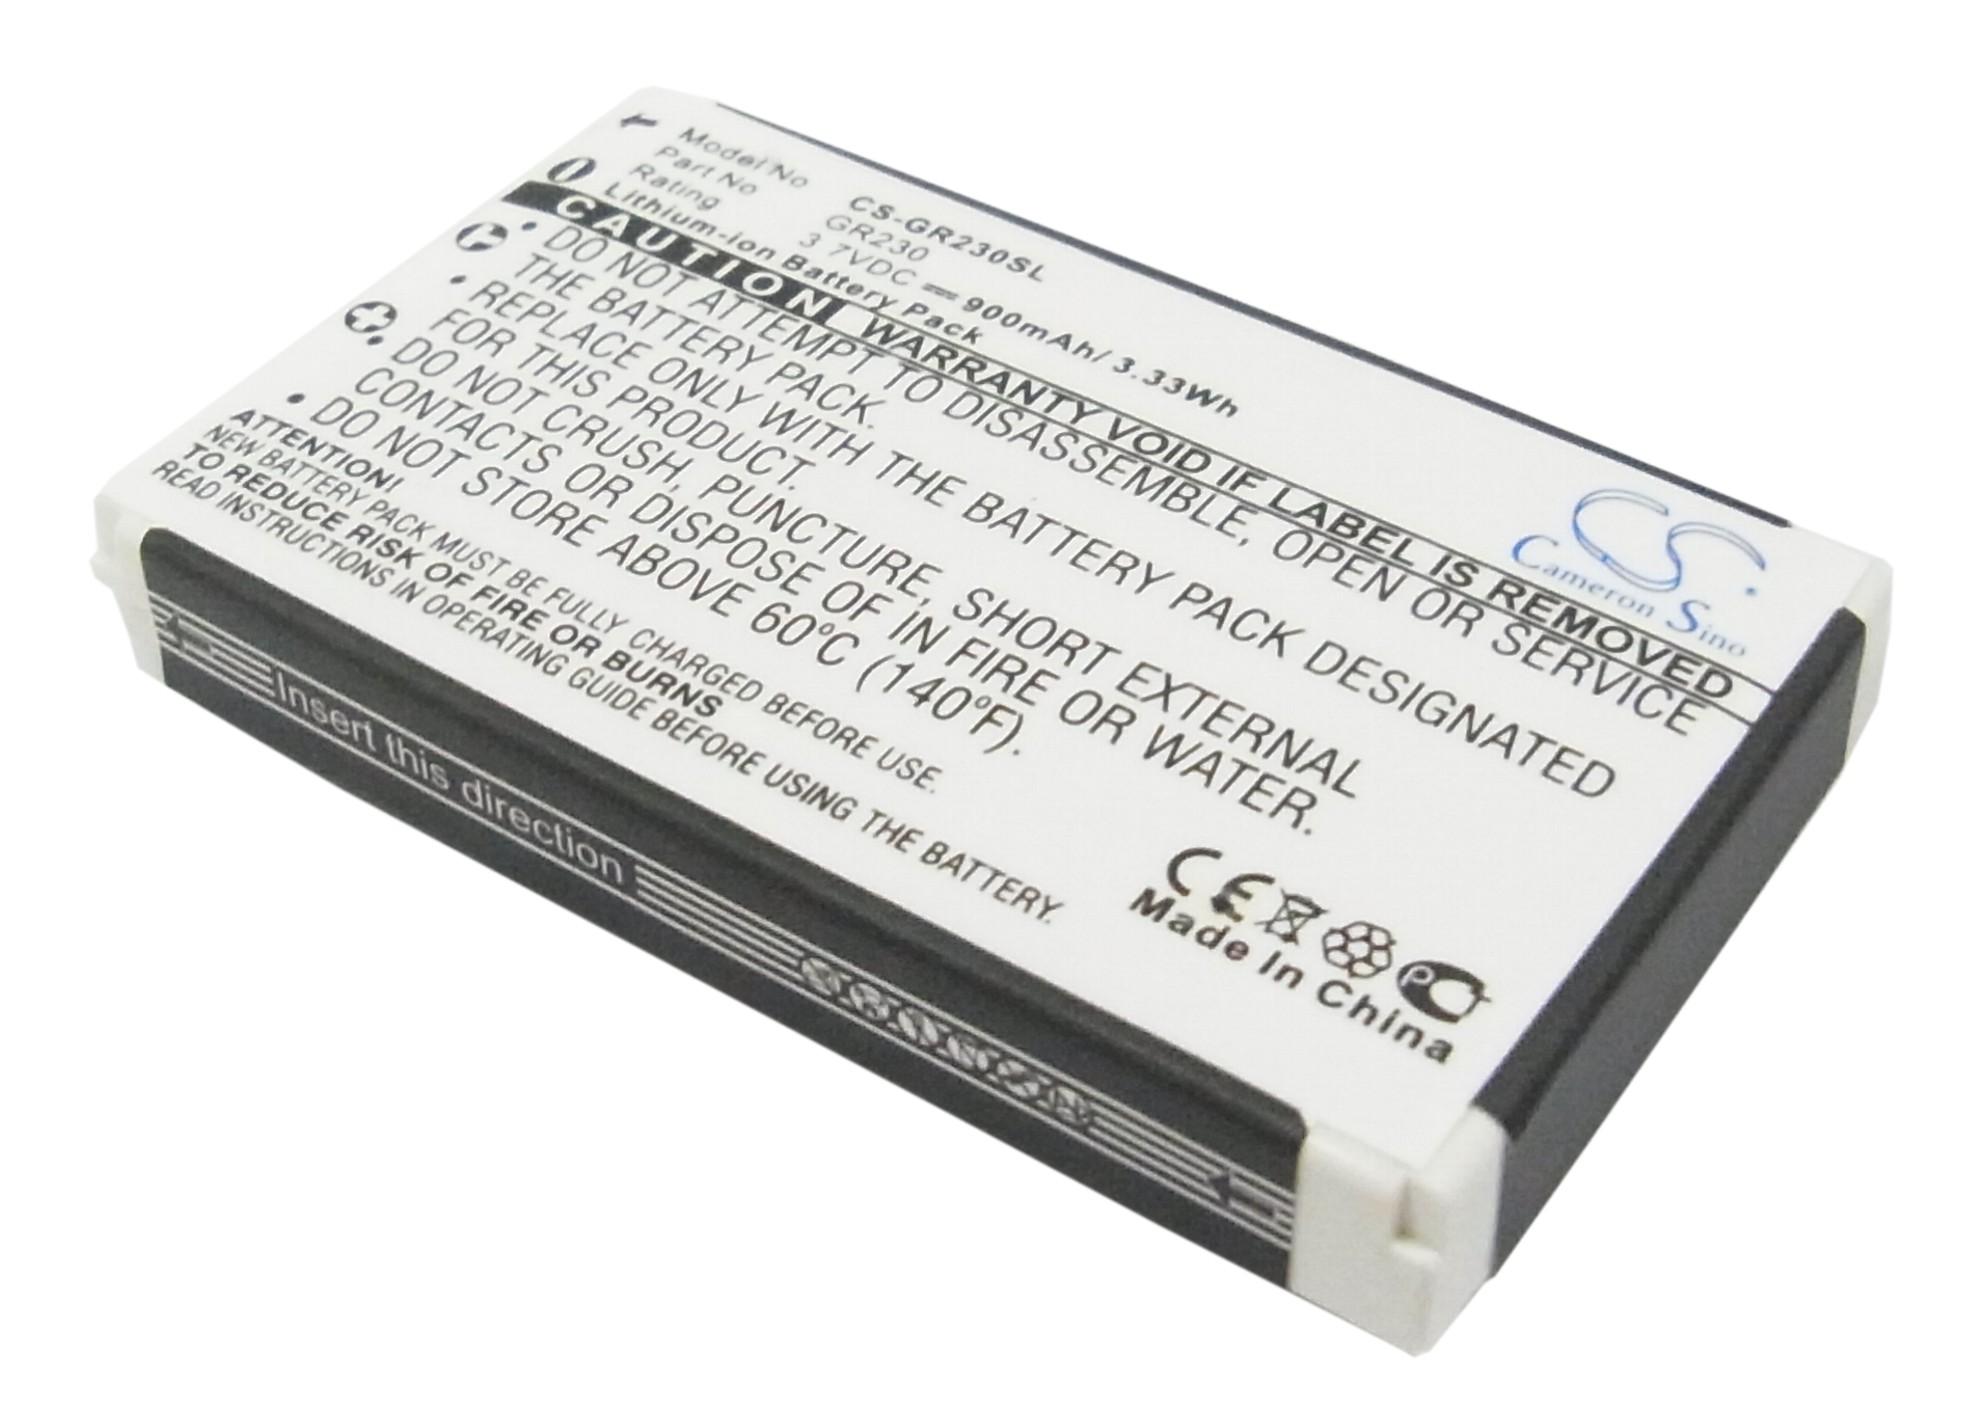 Cameron Sino baterie do navigací (gps) pro BELKIN Bluetooth GPS Receiver 3.7V Li-ion 900mAh šedá - neoriginální